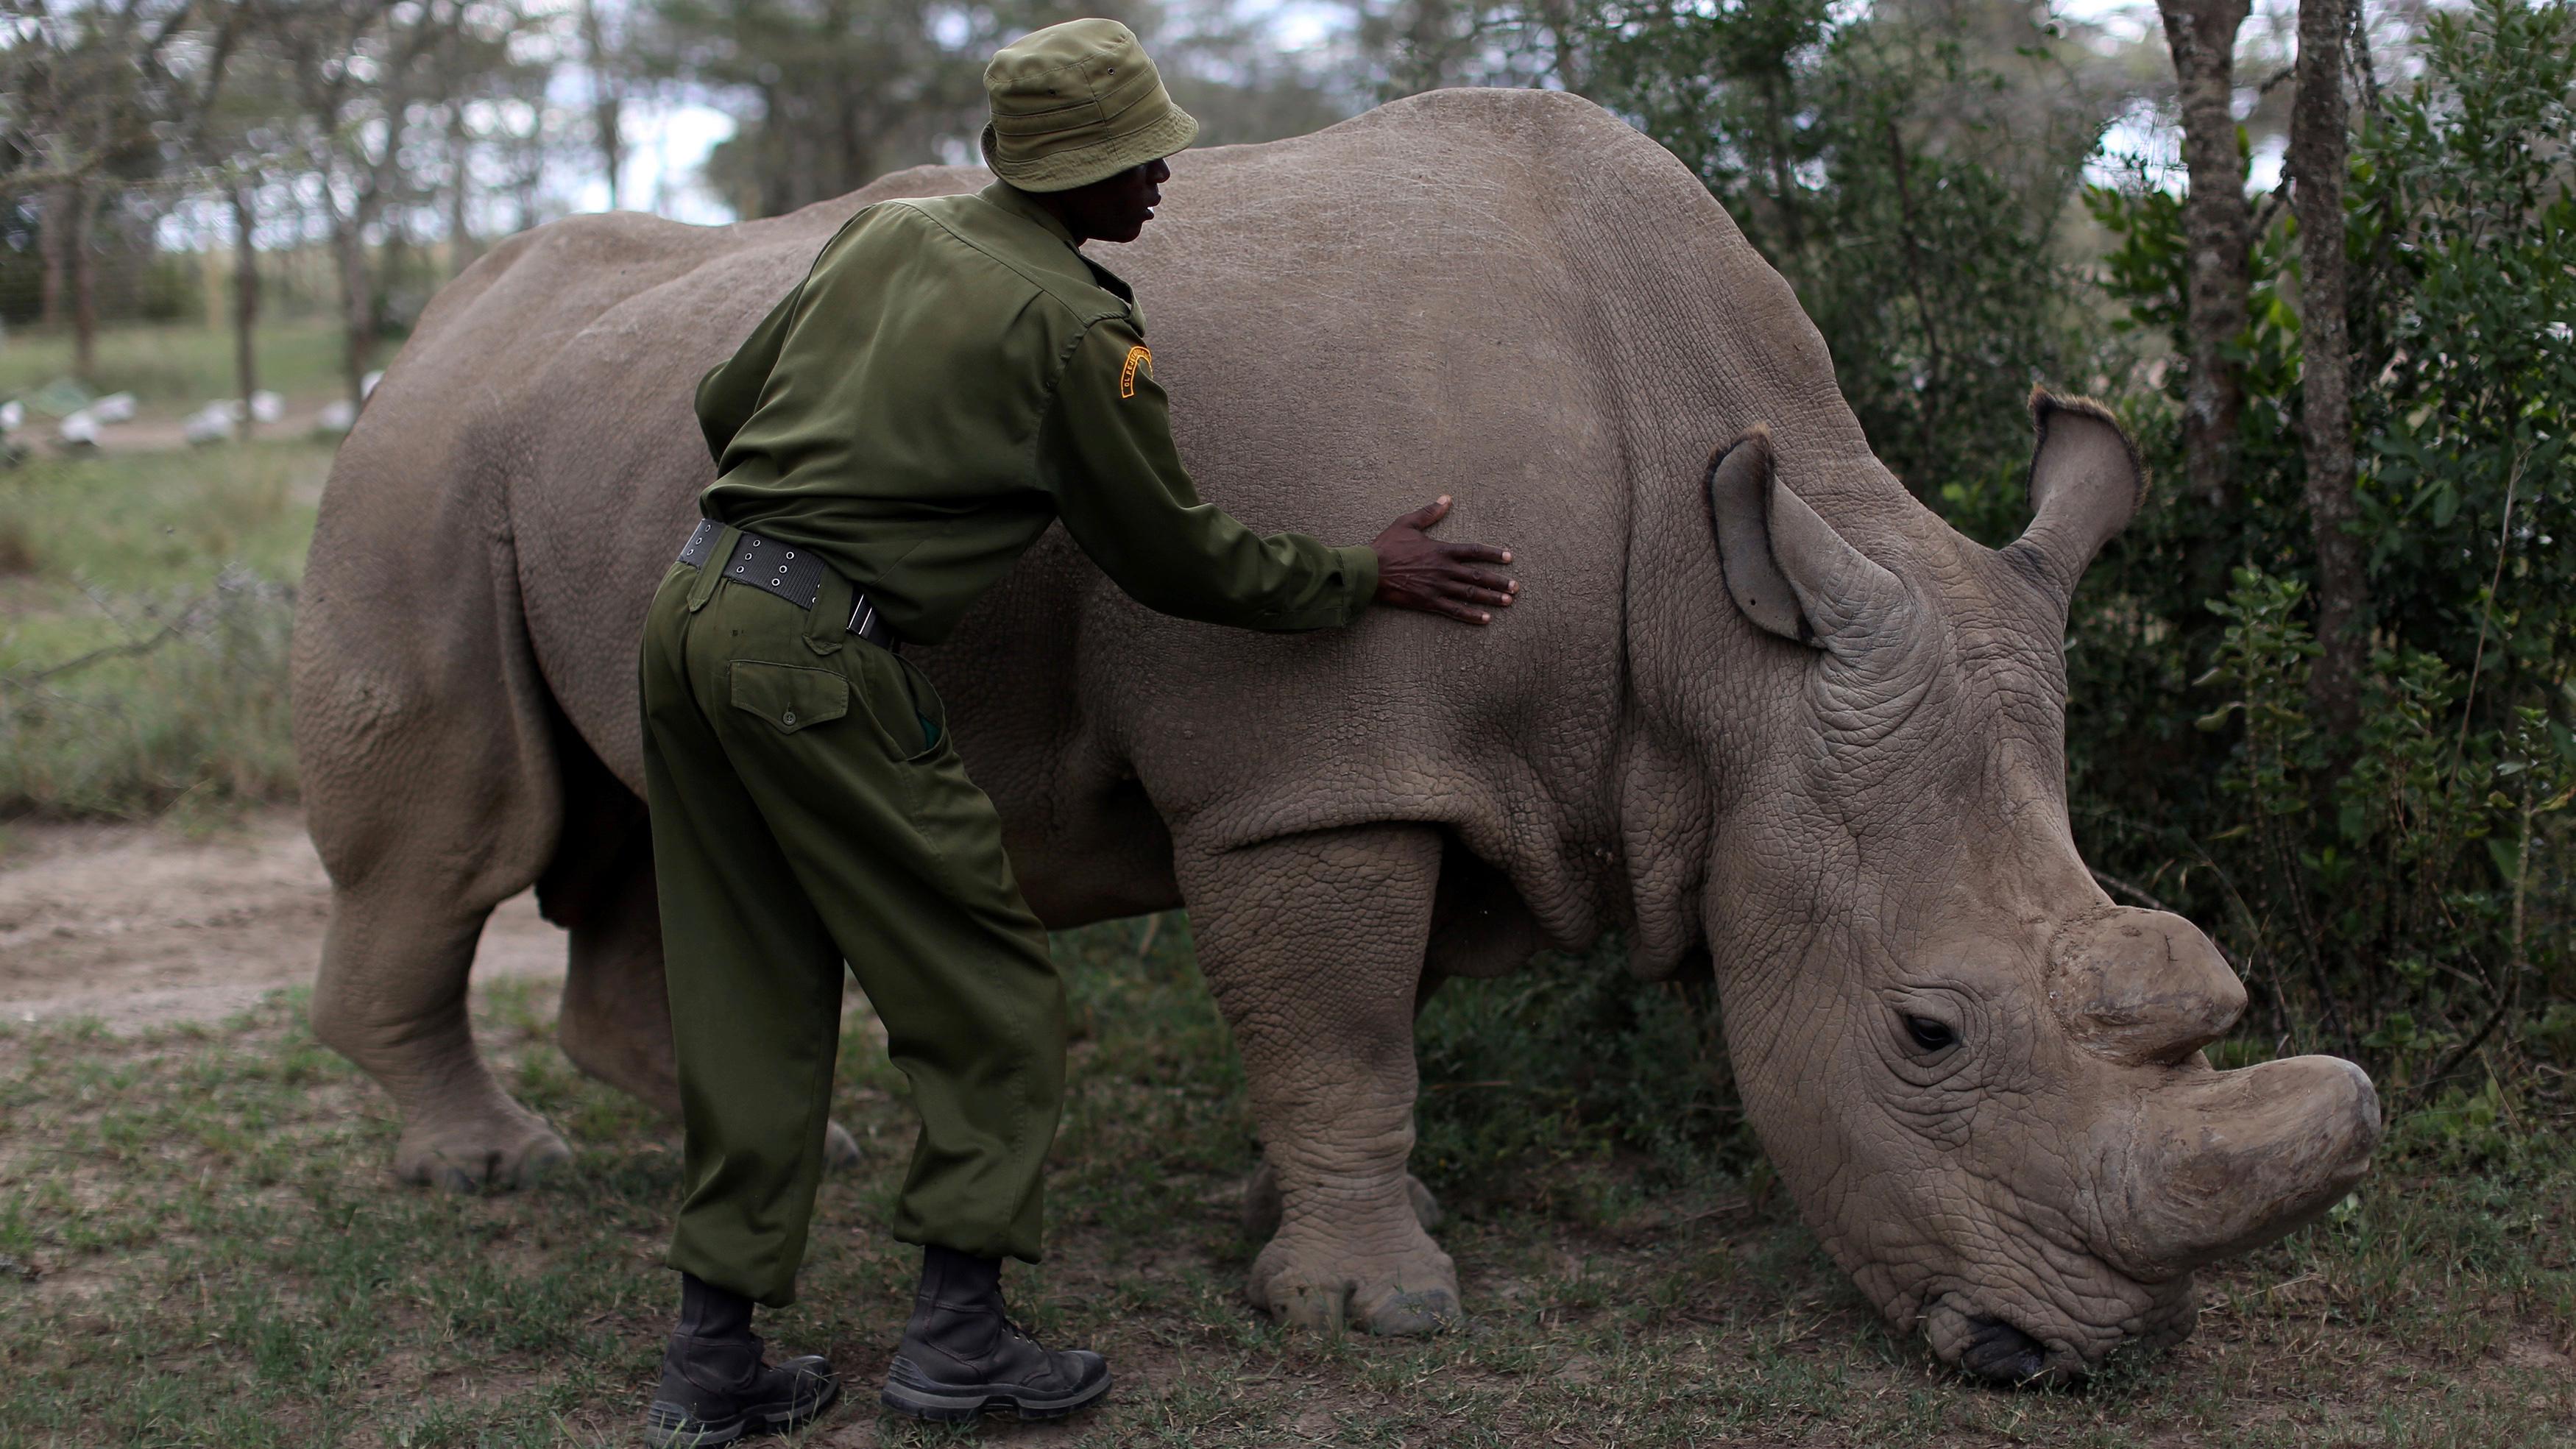 Rhino horn killings decrease as arrests of poachers increase in South Africa